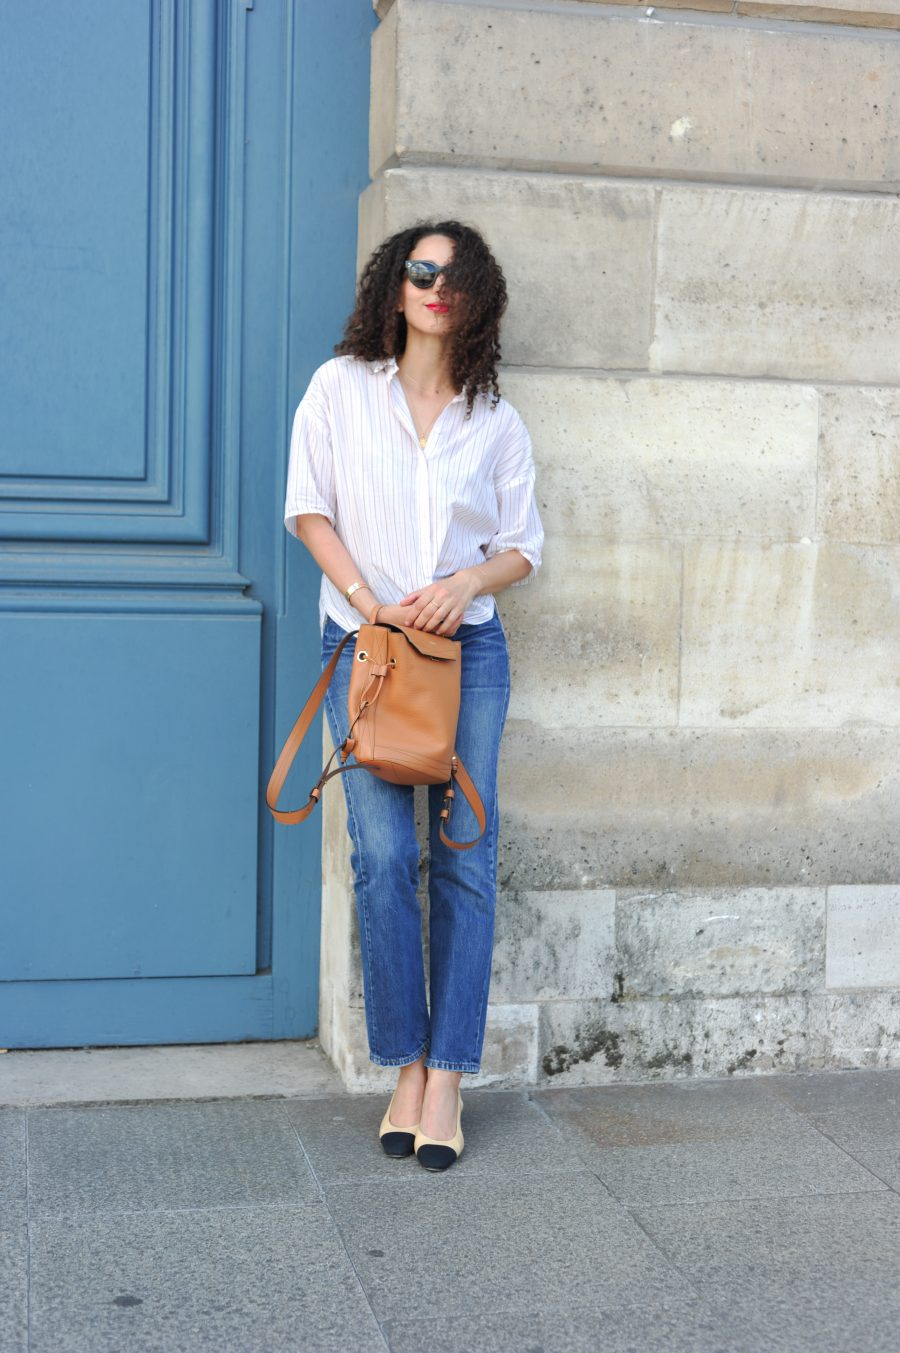 chemise-chemins-blancs-4